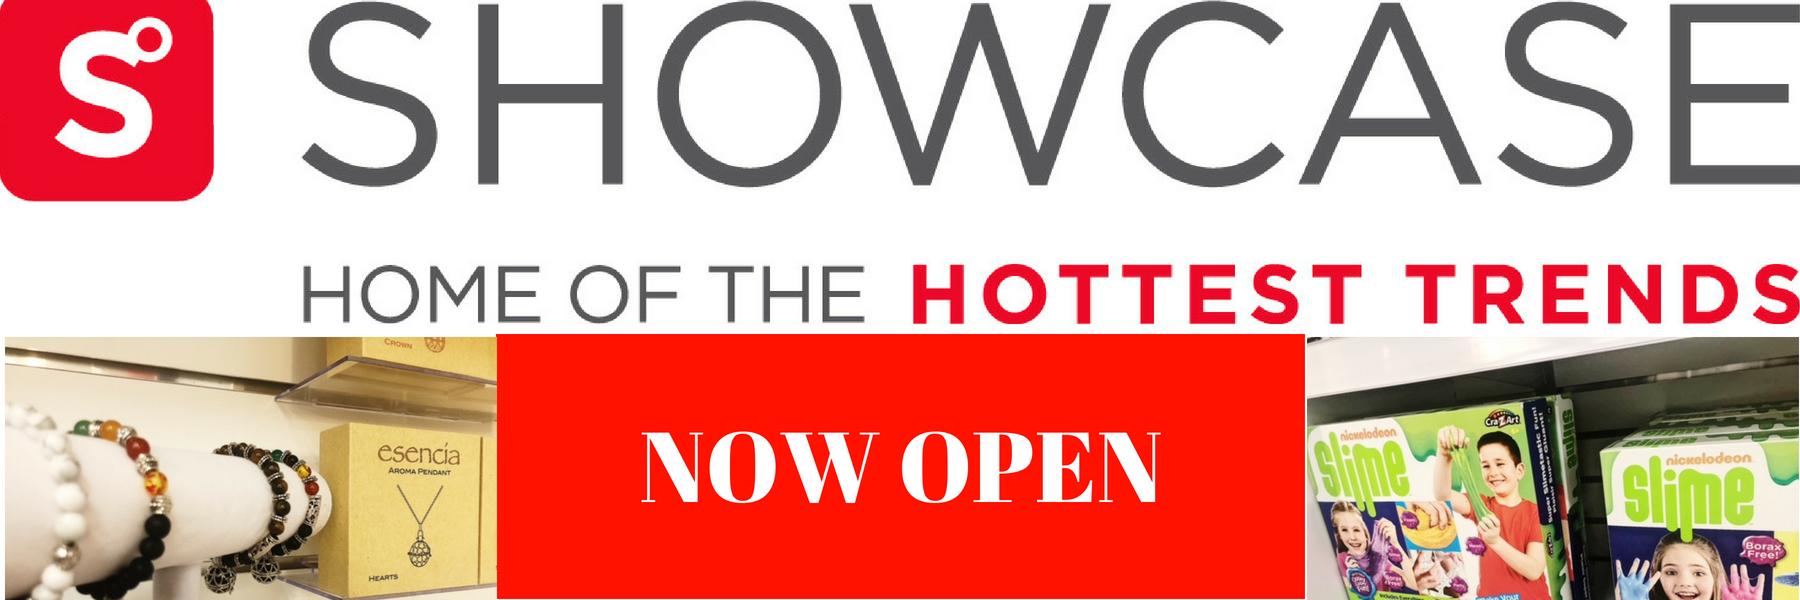 Showcase NOW OPEN_website header